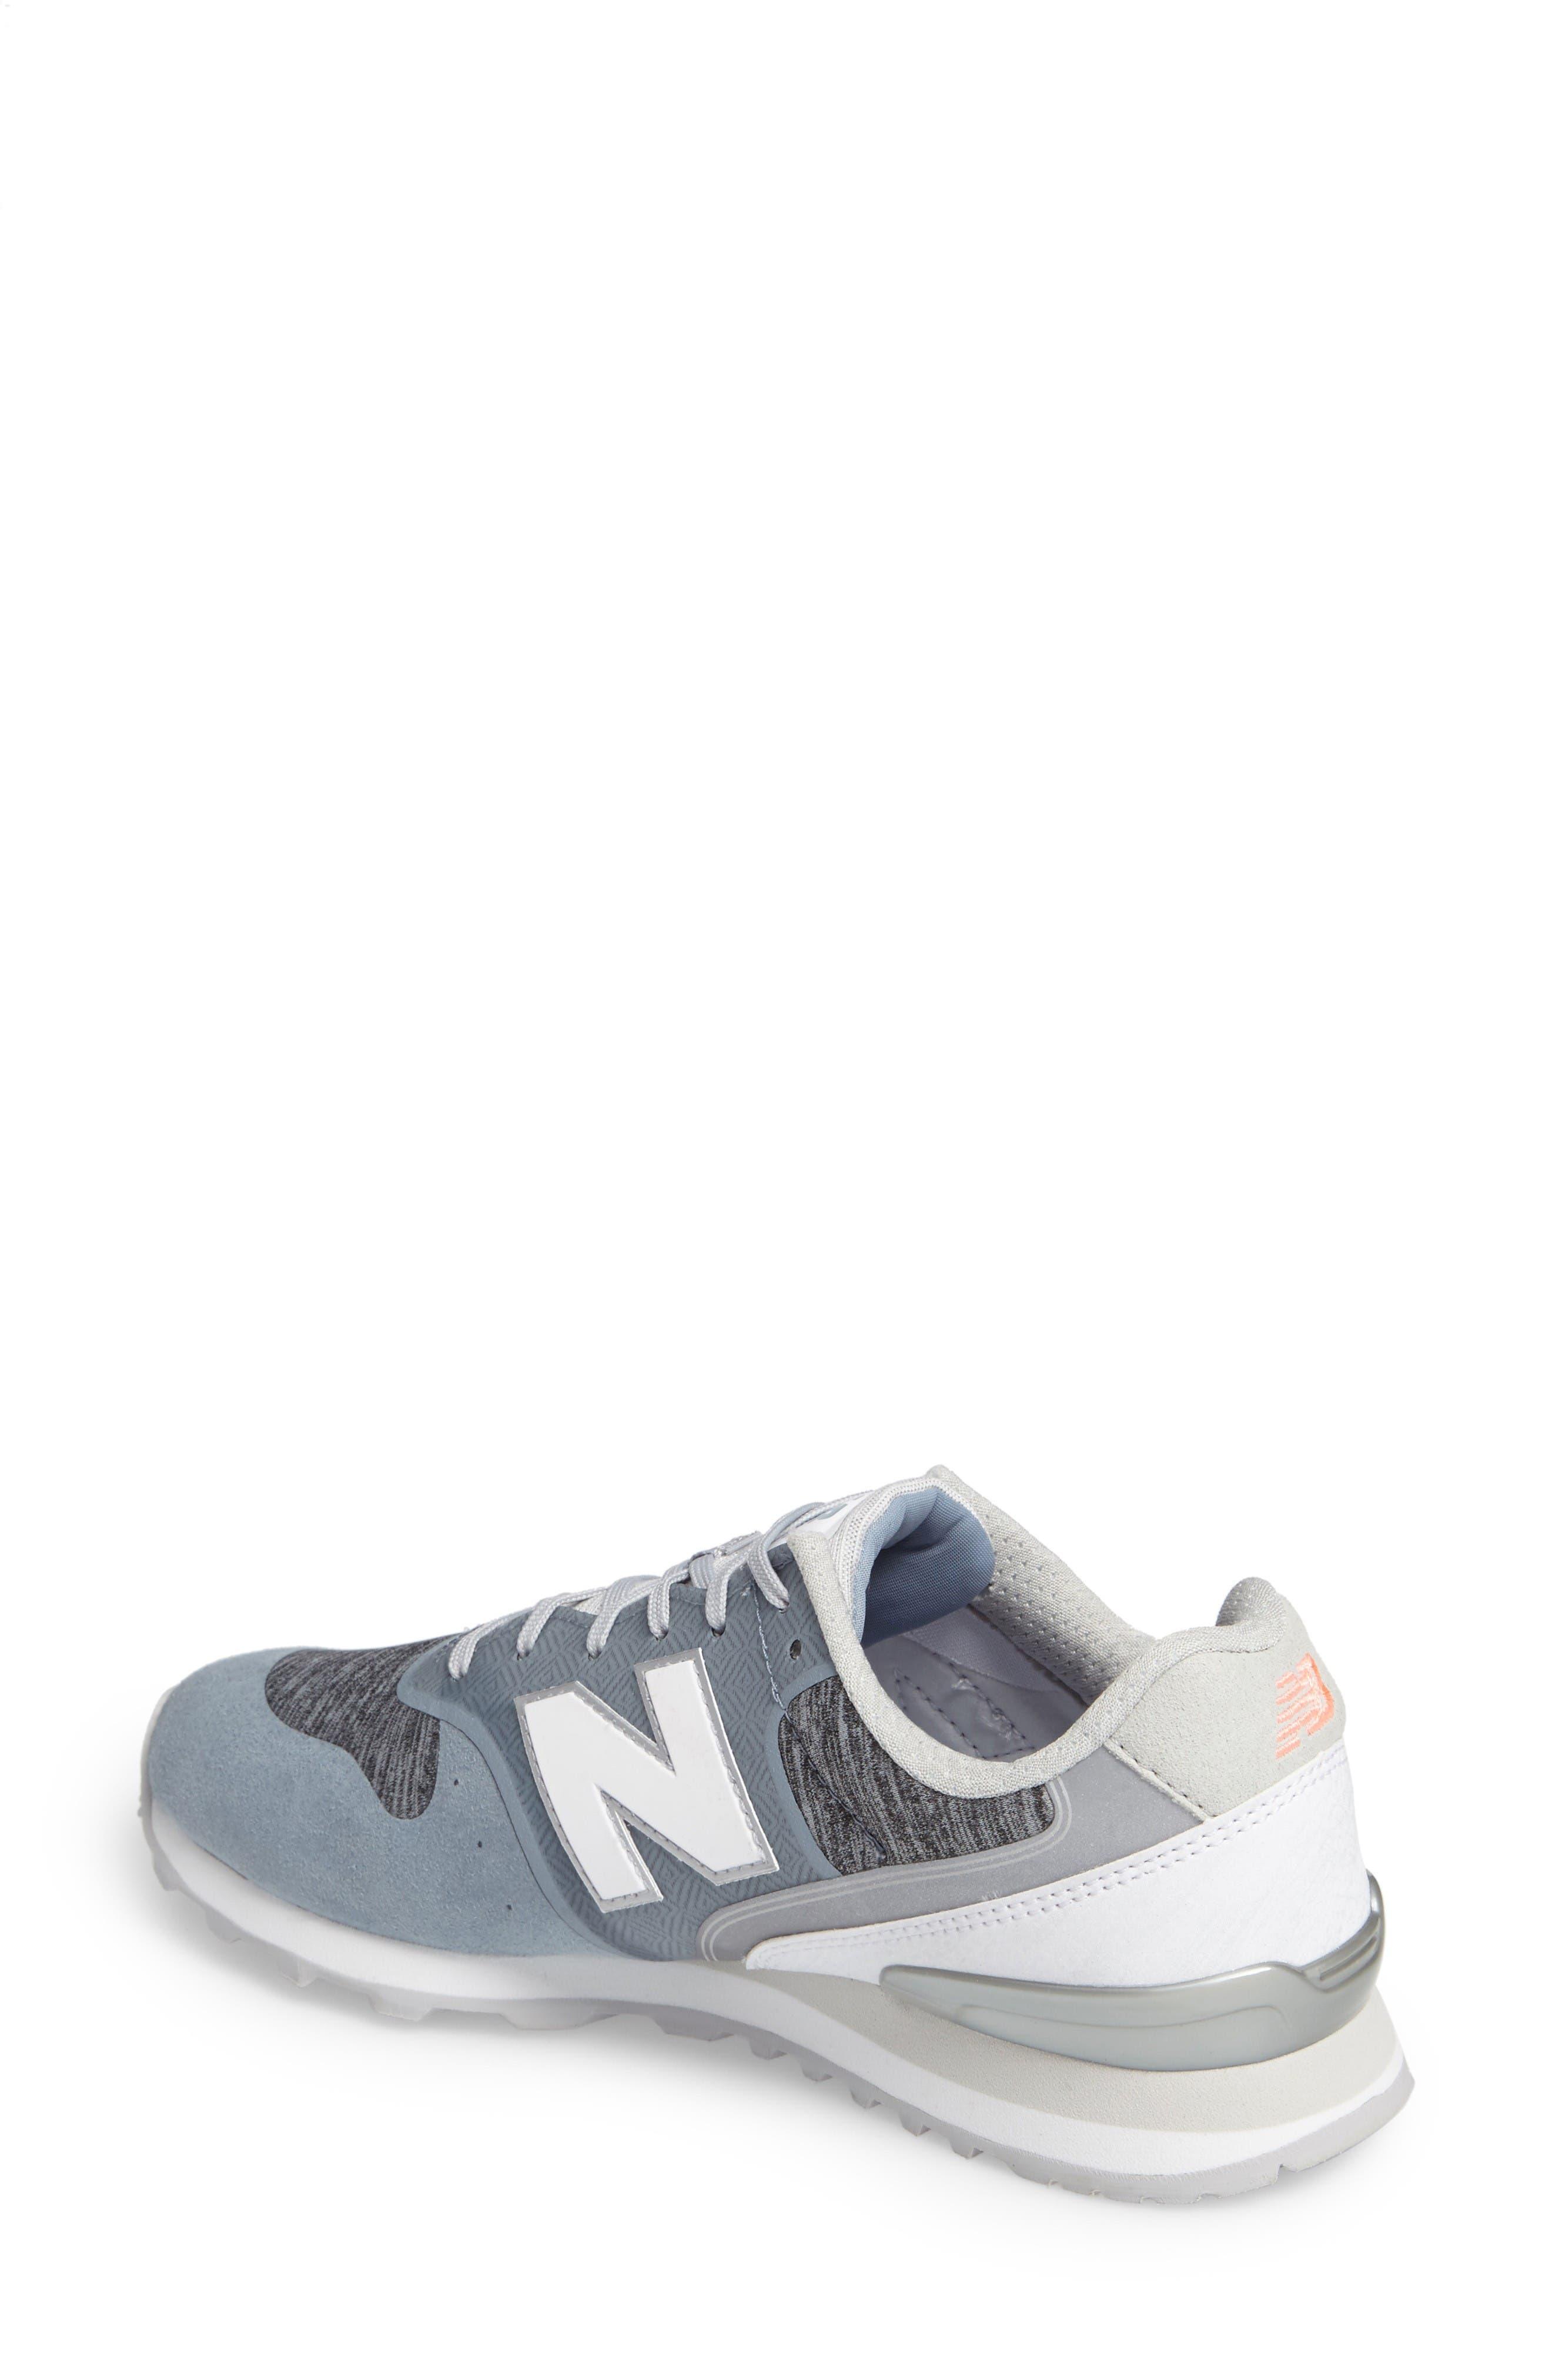 Alternate Image 2  - New Balance 696 Re-Engineered Sneaker (Women)